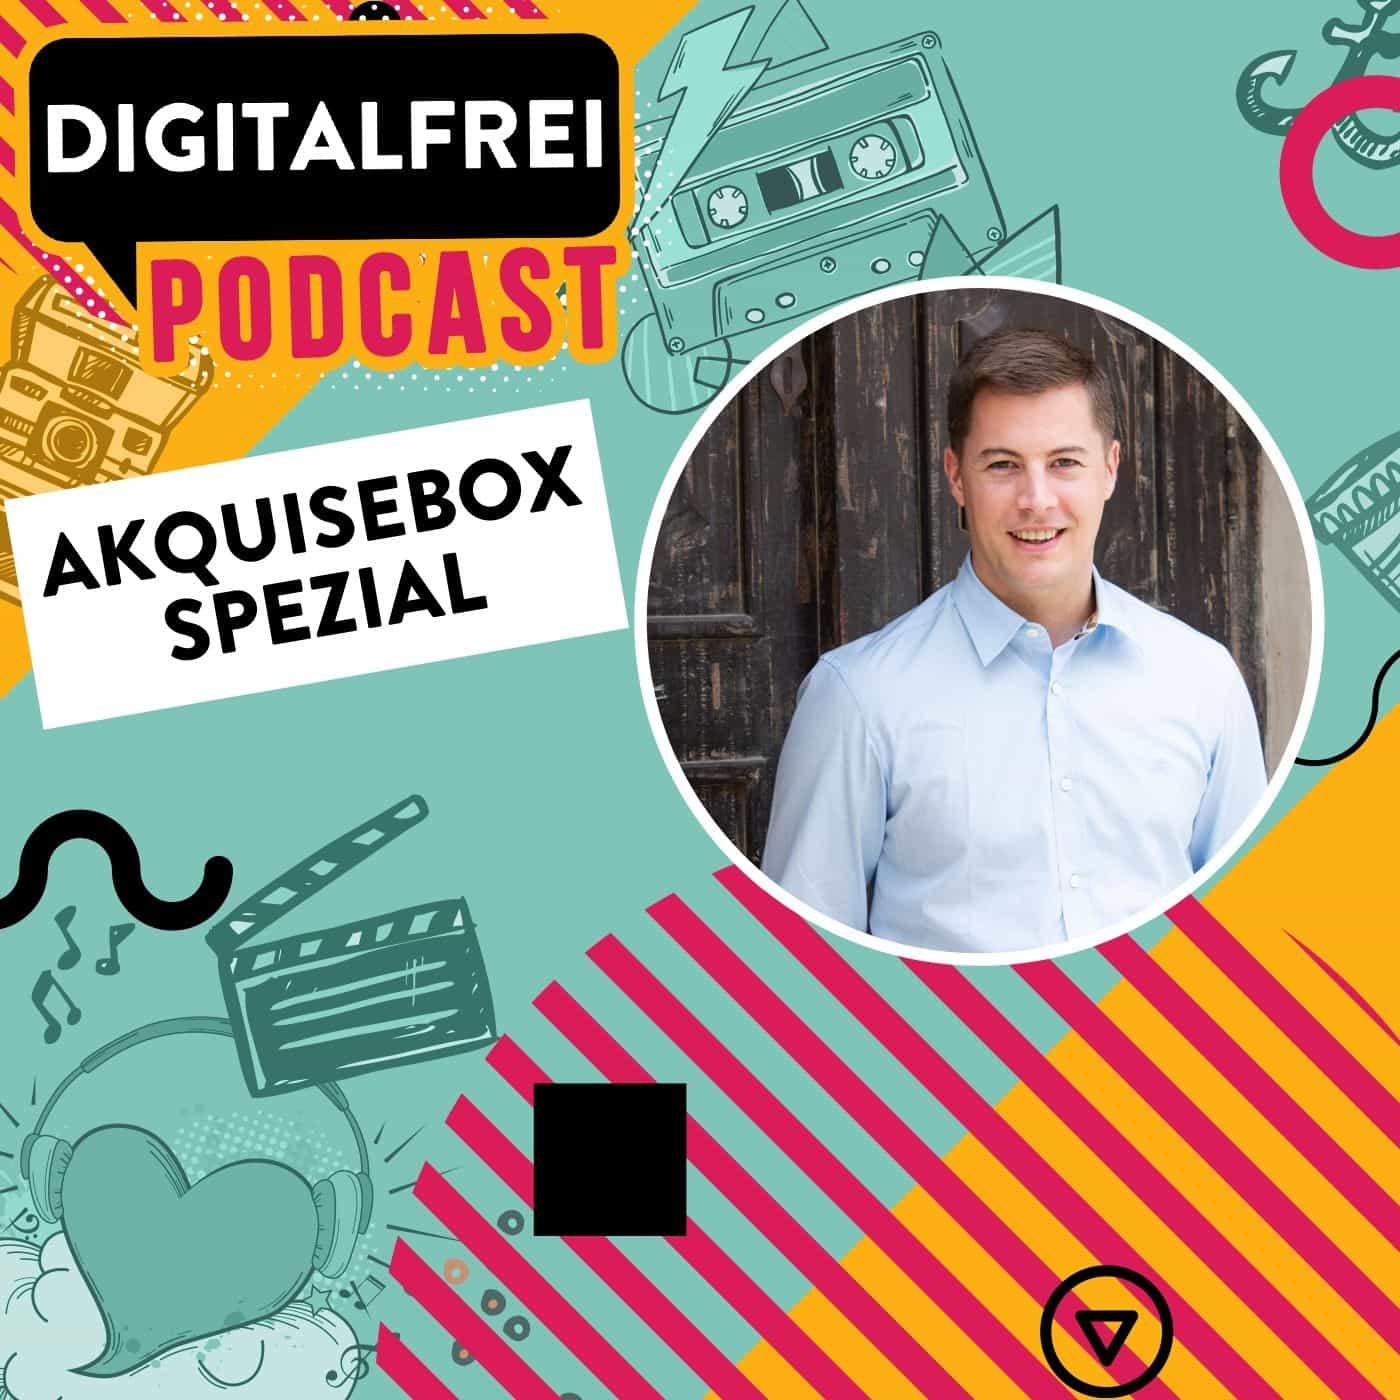 Akquisebox Spezial – Jakob Hager – Digitaler Serienunternehmer